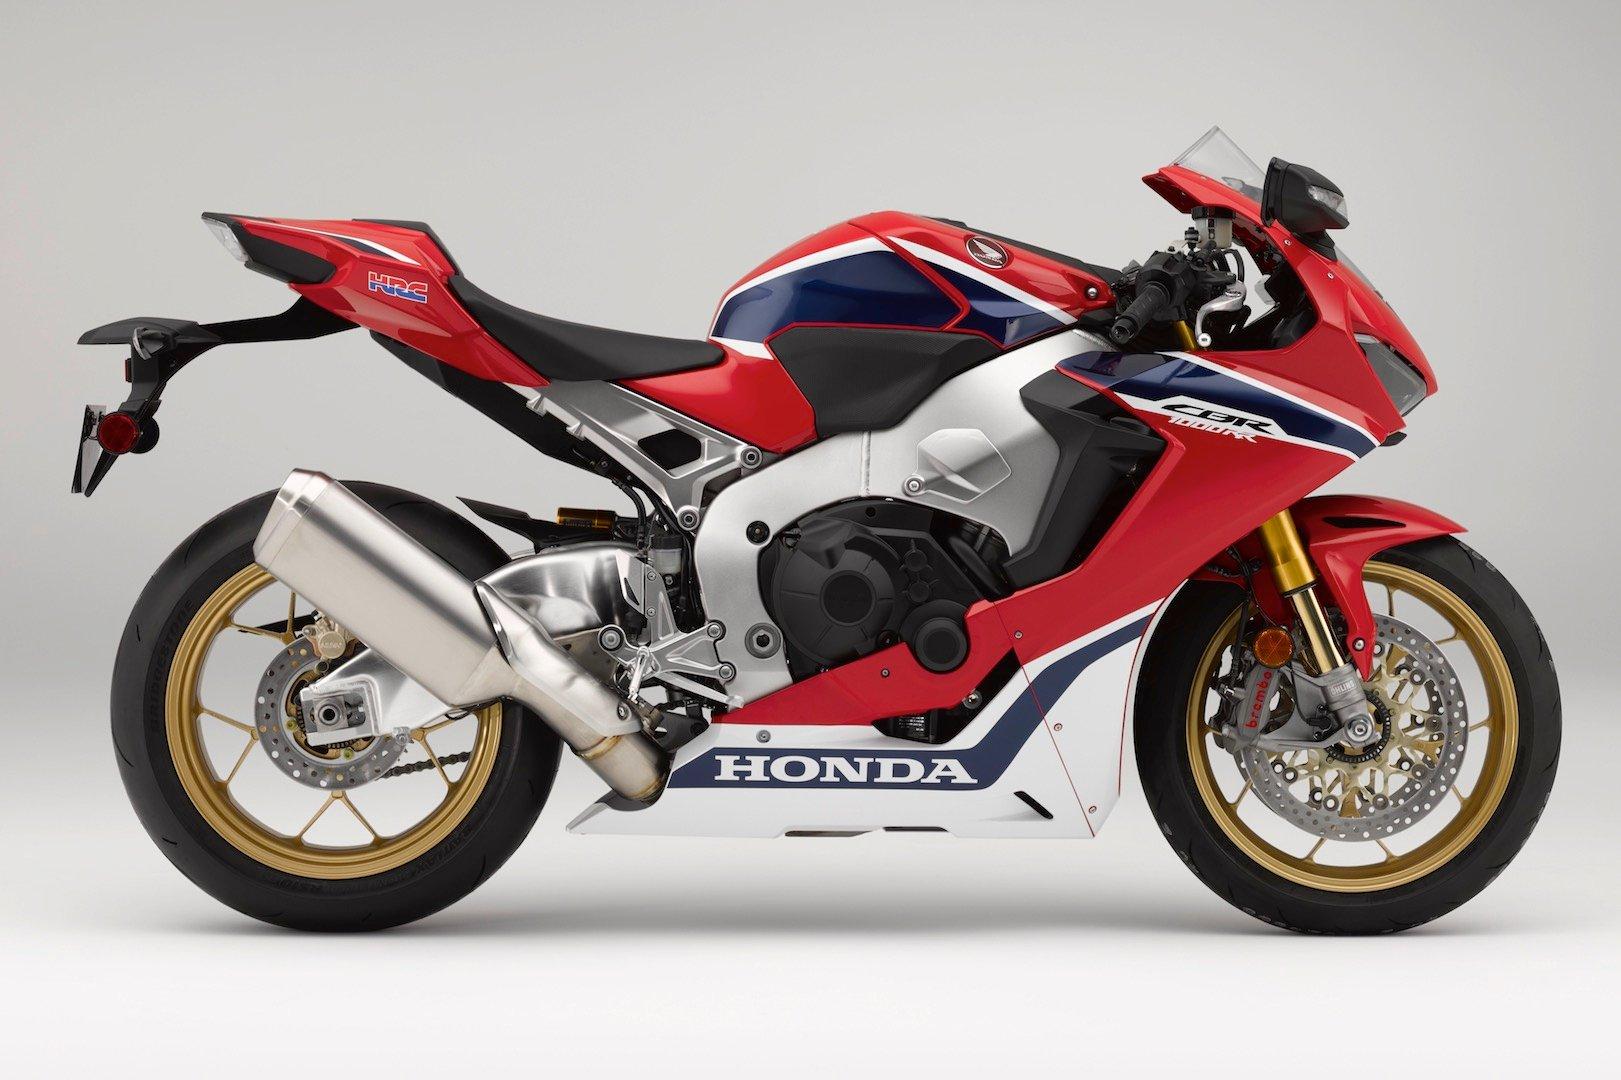 2018 Honda CBR1000RR SP vs. 2018 Kawasaki Ninja ZX-10R Superbike Comparison - right side CBR1000RR